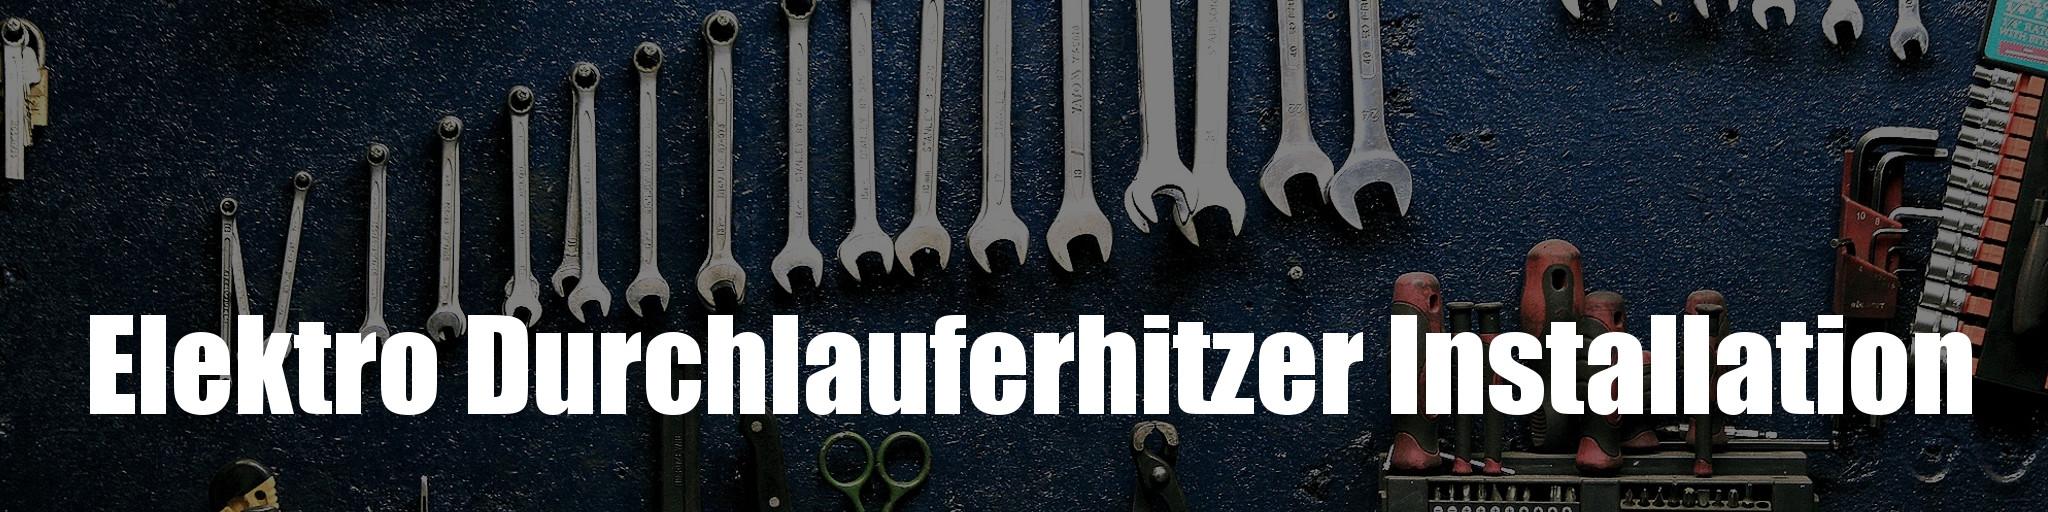 Installation - profi-durchlauferhitzer.deprofi-durchlauferhitzer.de